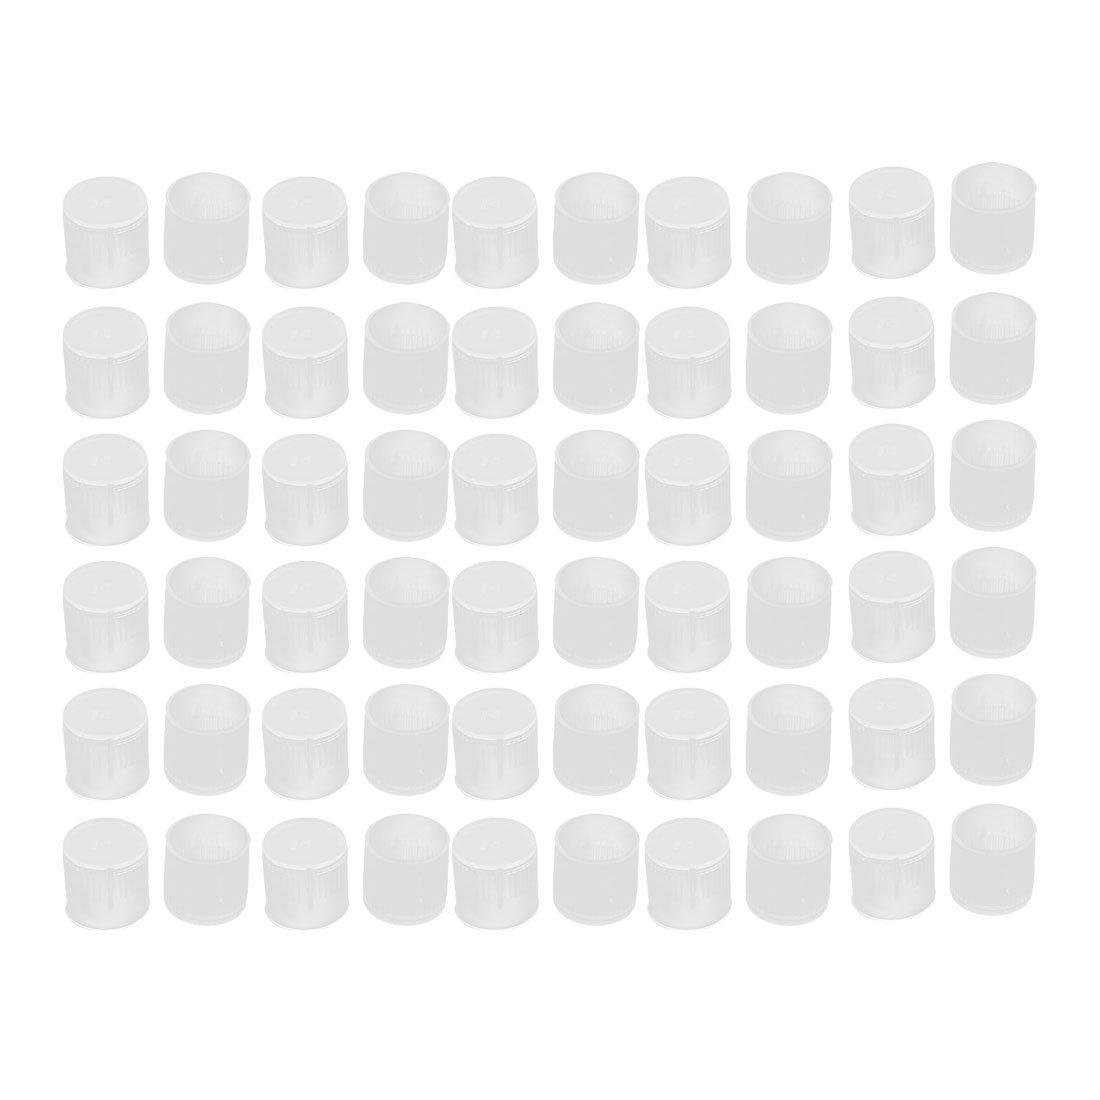 uxcell 60Pcs 14mm Inner Dia PE Plastic End Cap Bolt Thread Protector Tube Cover